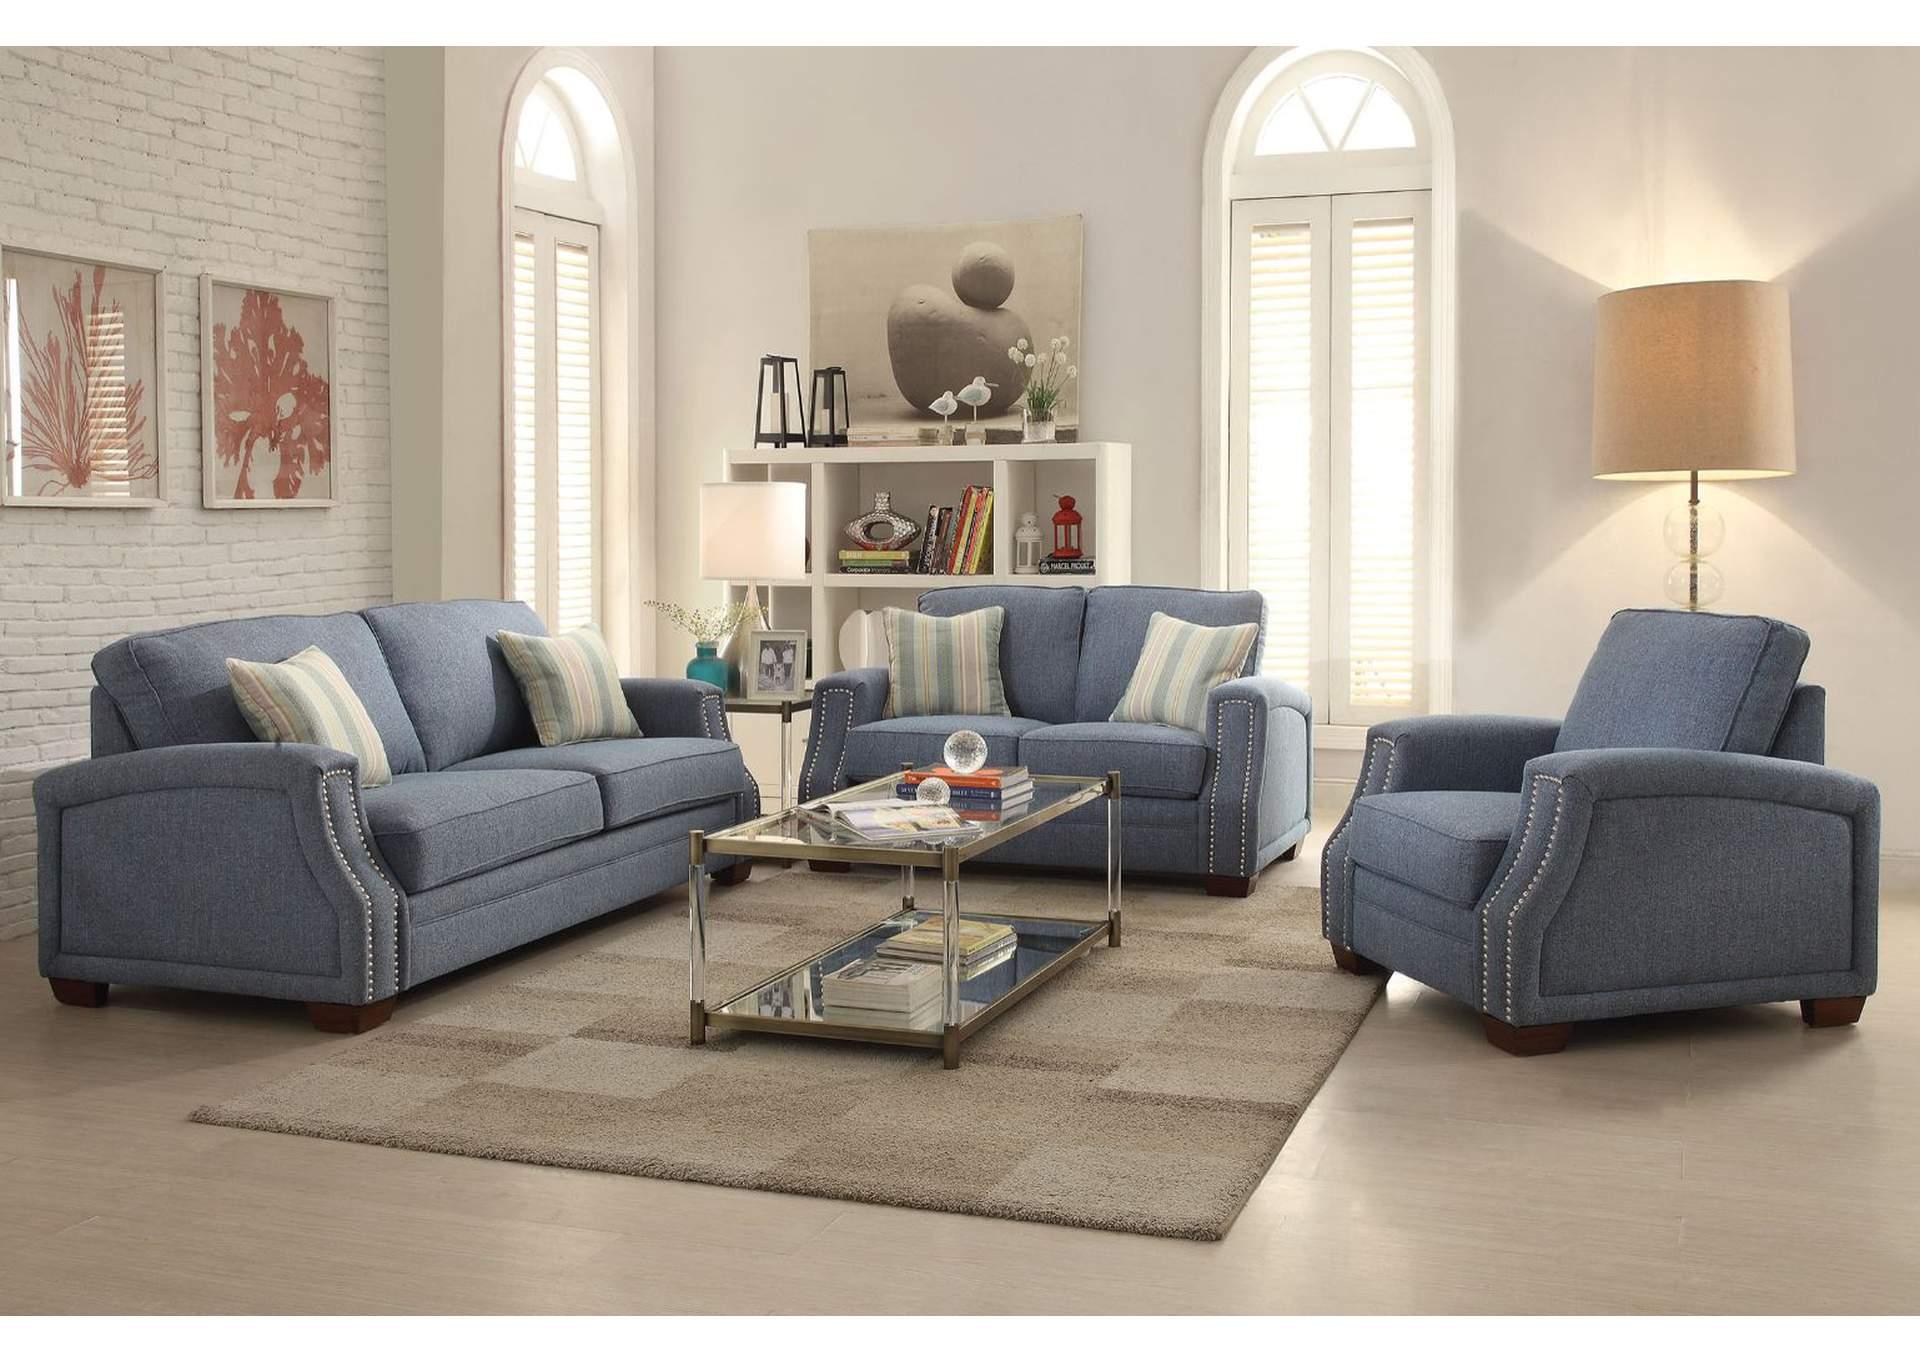 Foothills Family Furniture Betisa Blue Sofa w/2 Pillow